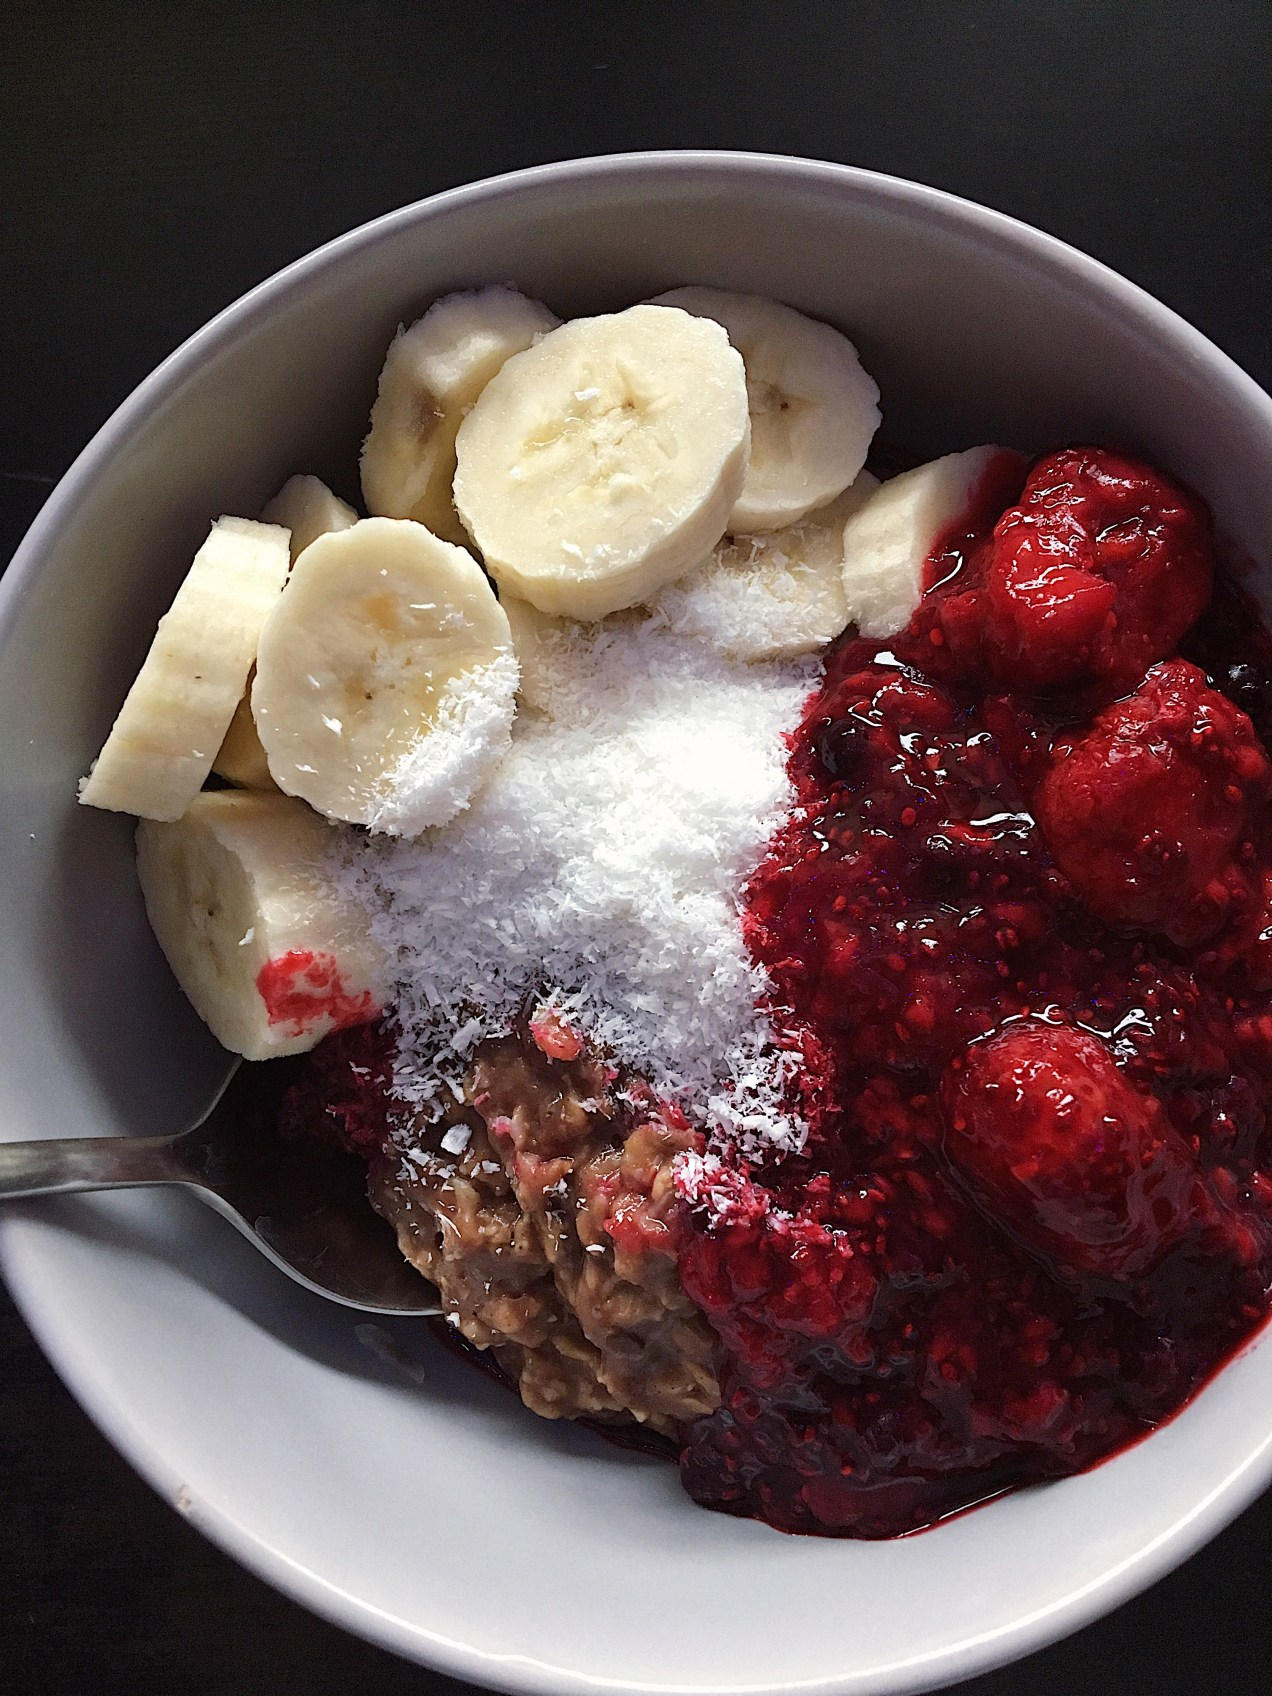 delicious oatmeal recipe